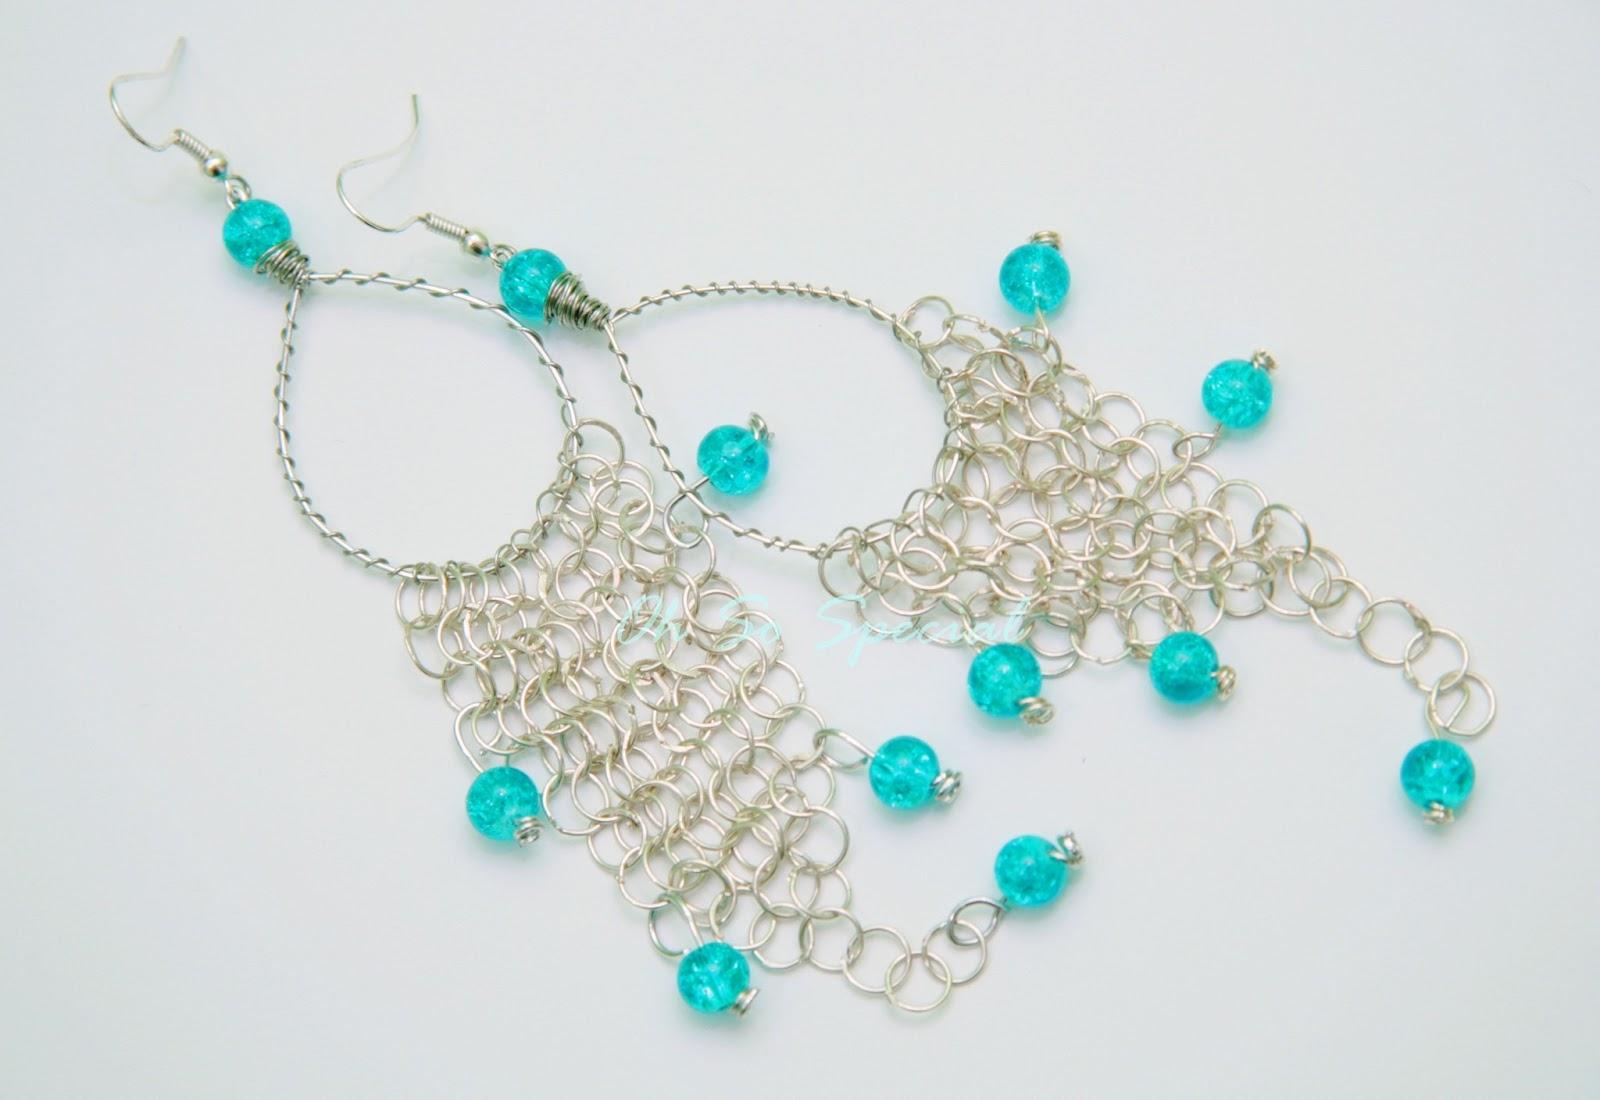 Kolczyki handmade z morskimi koralikami